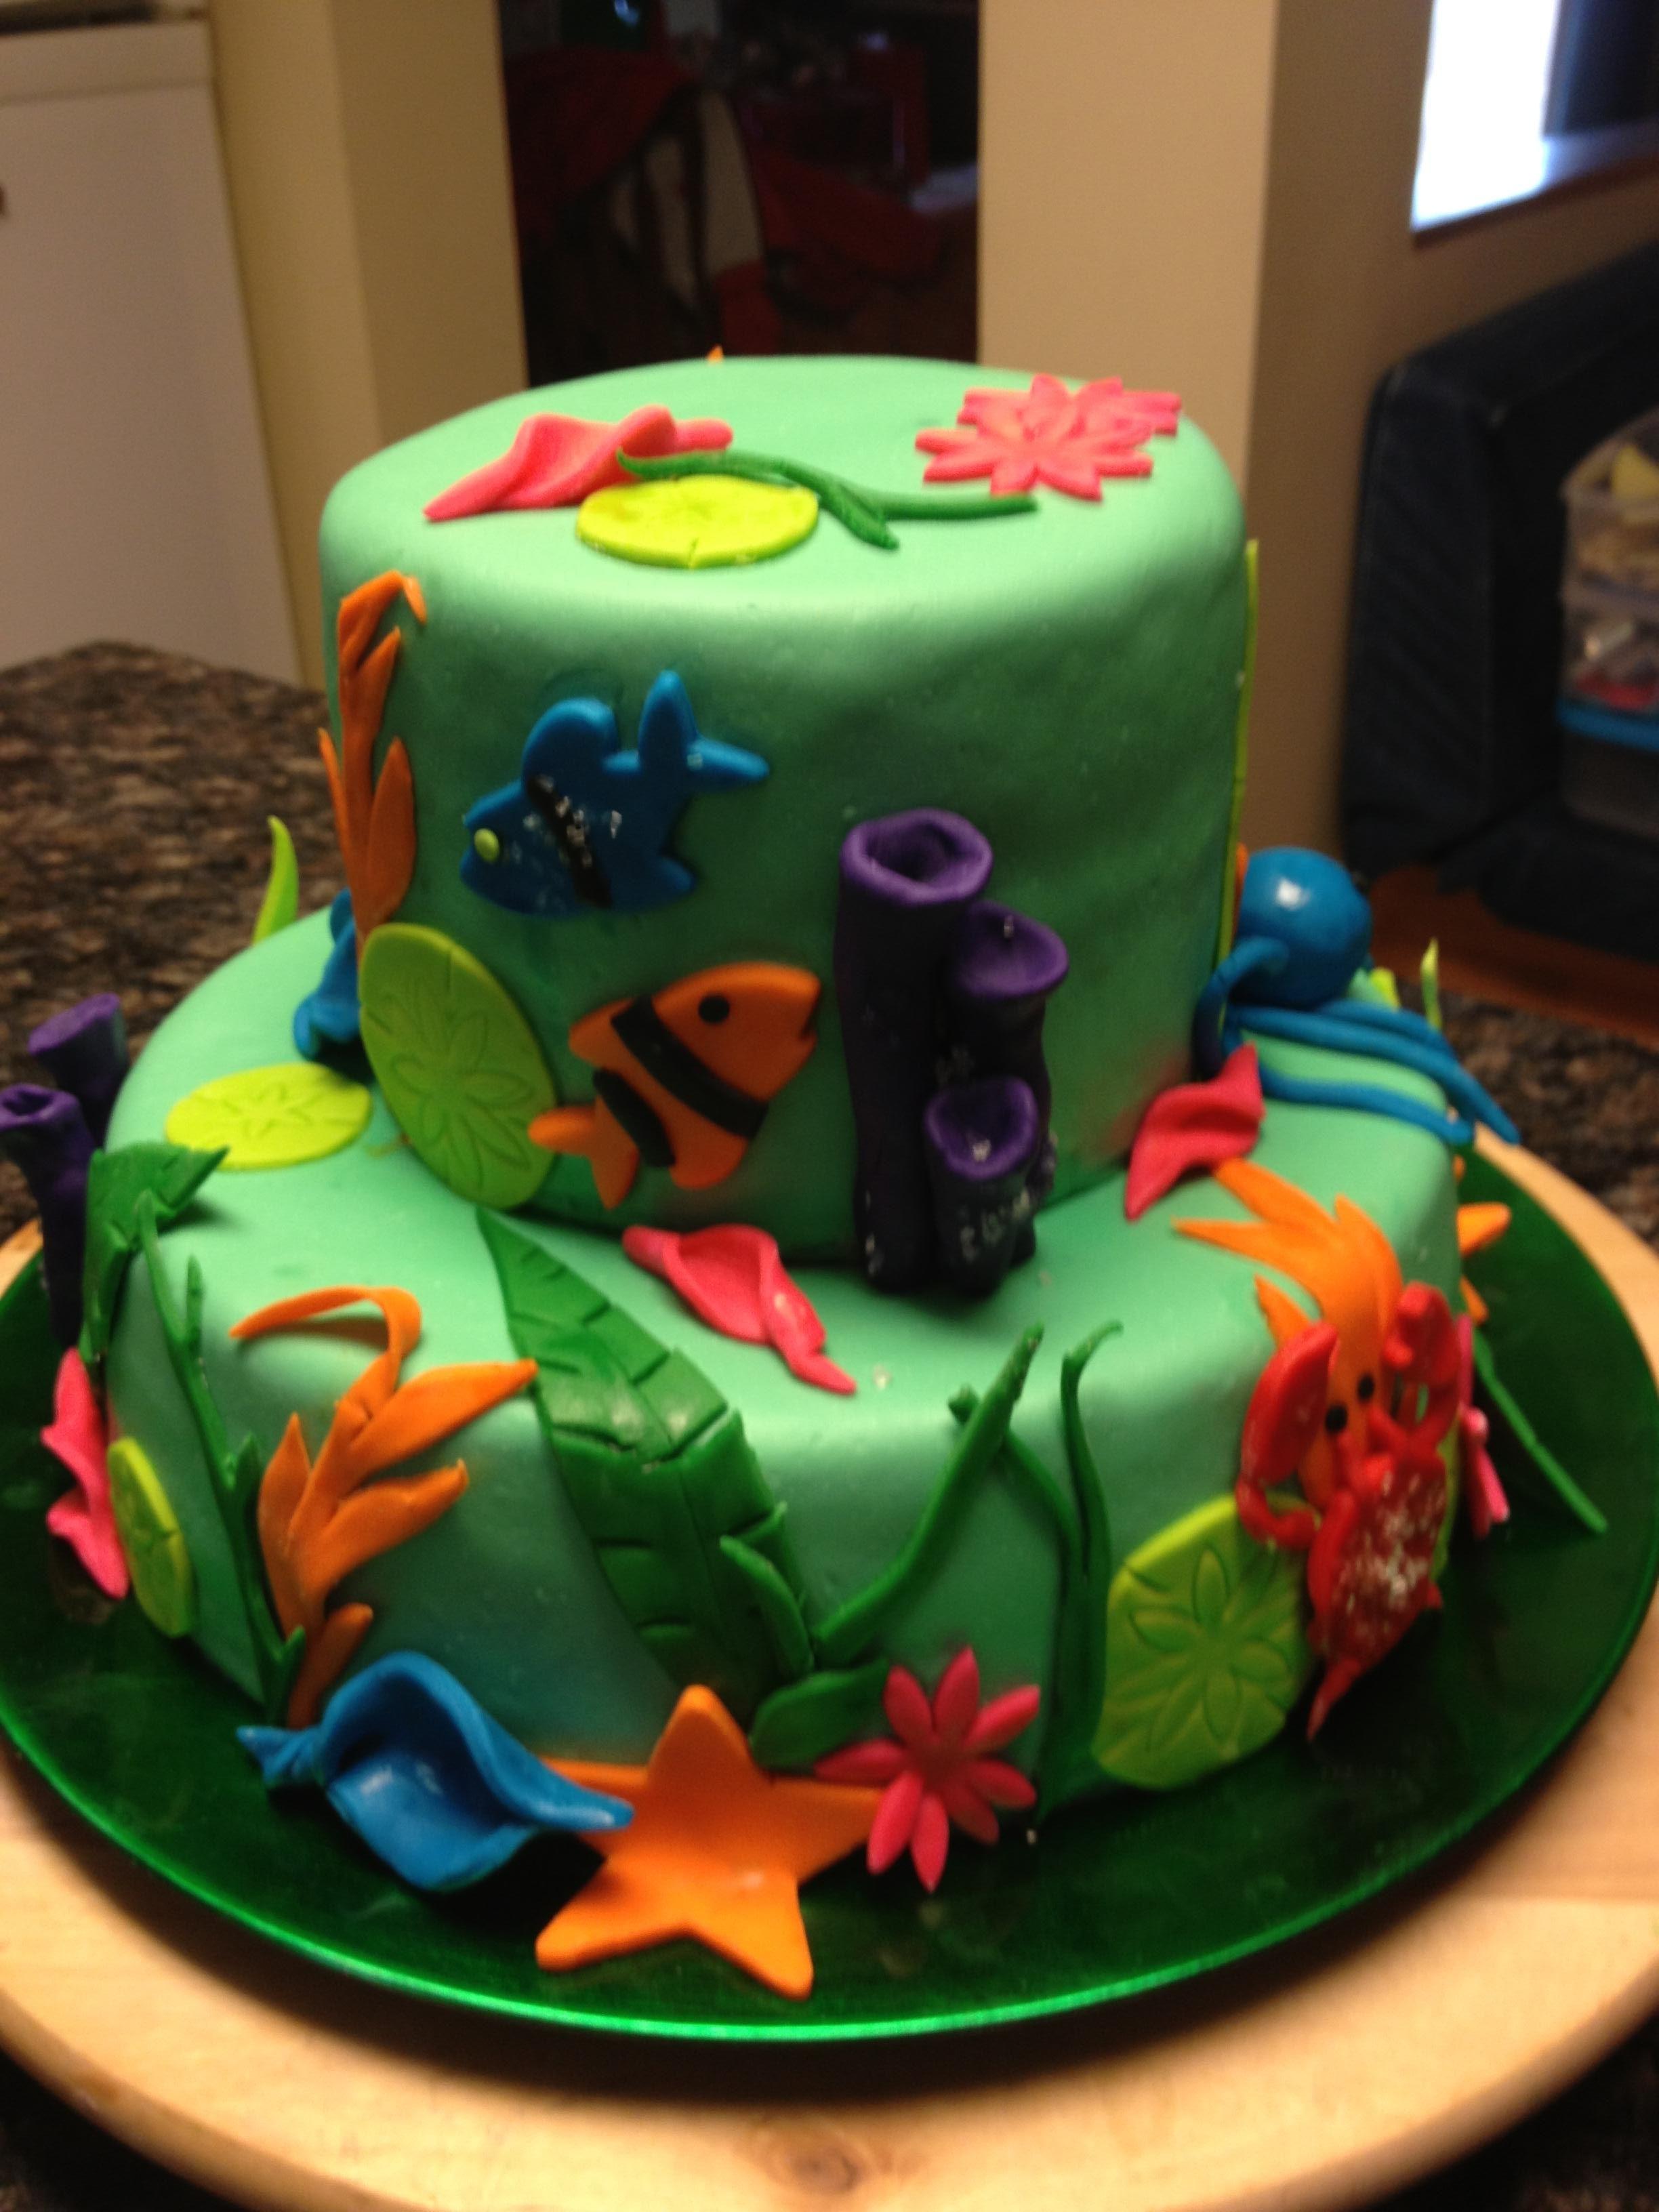 Pin on Bev's Bakin' Cakes!